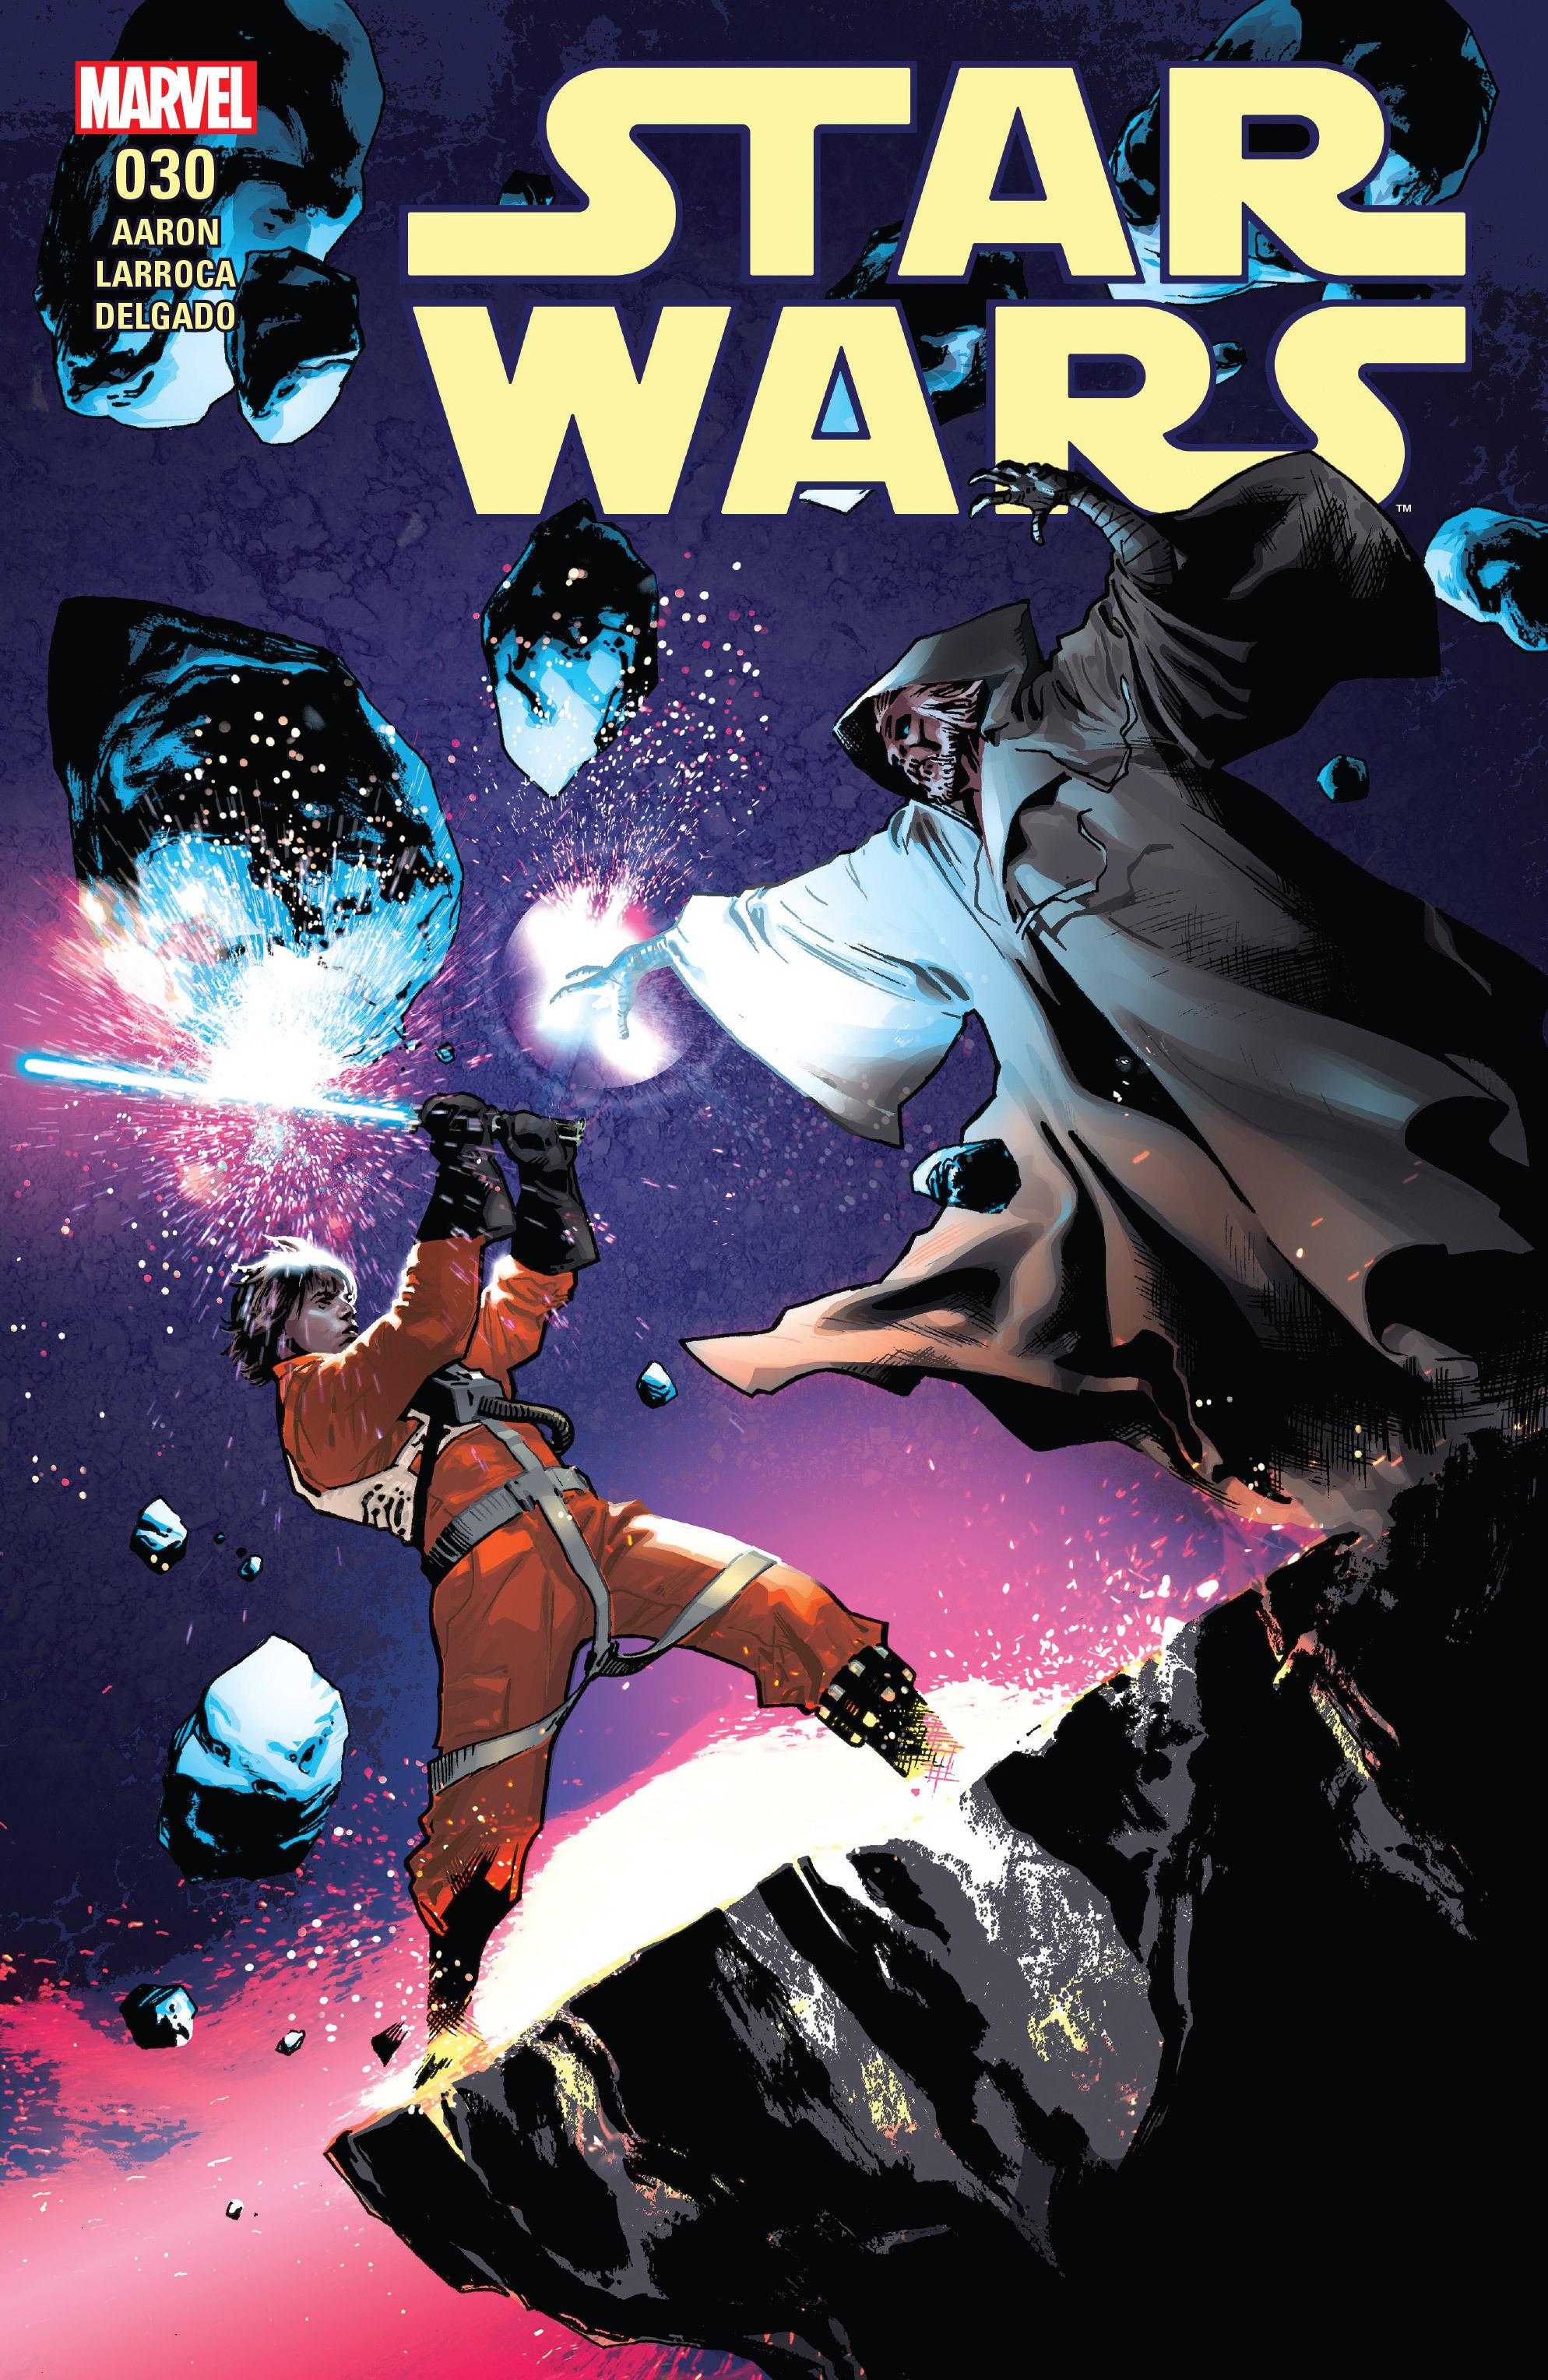 Star Wars 030-000a